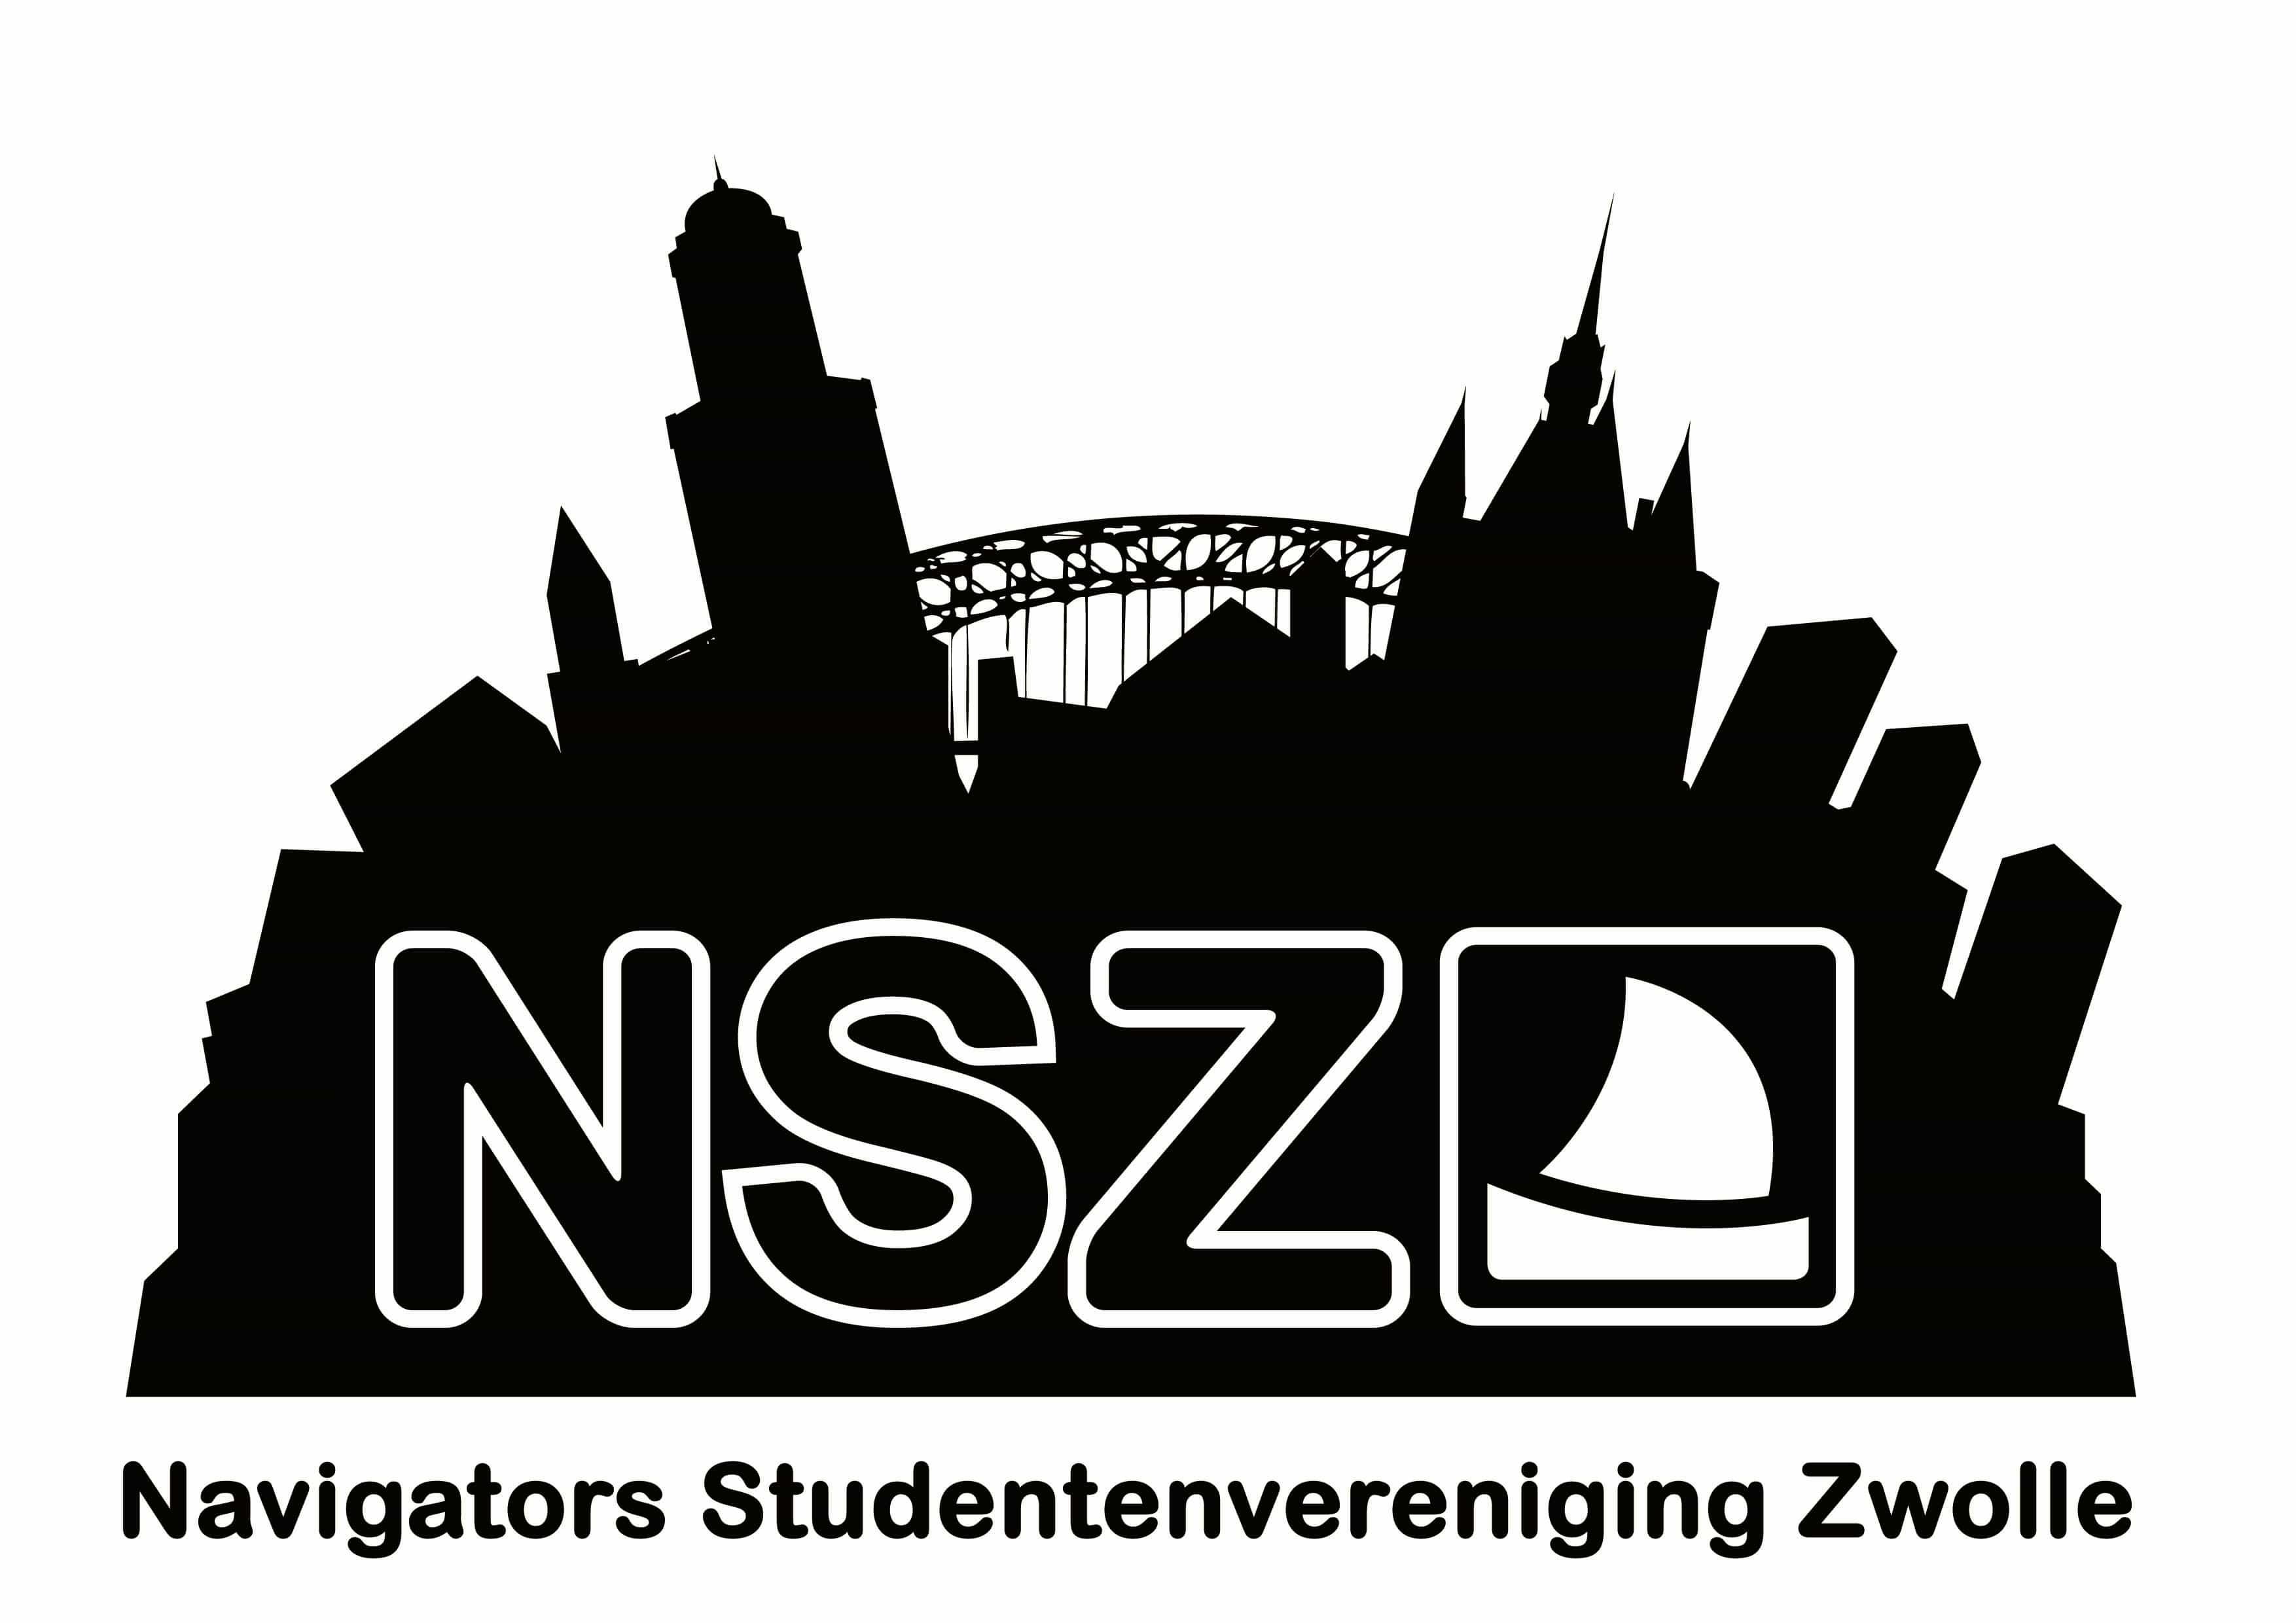 Navigators Studentenvereniging Zwolle